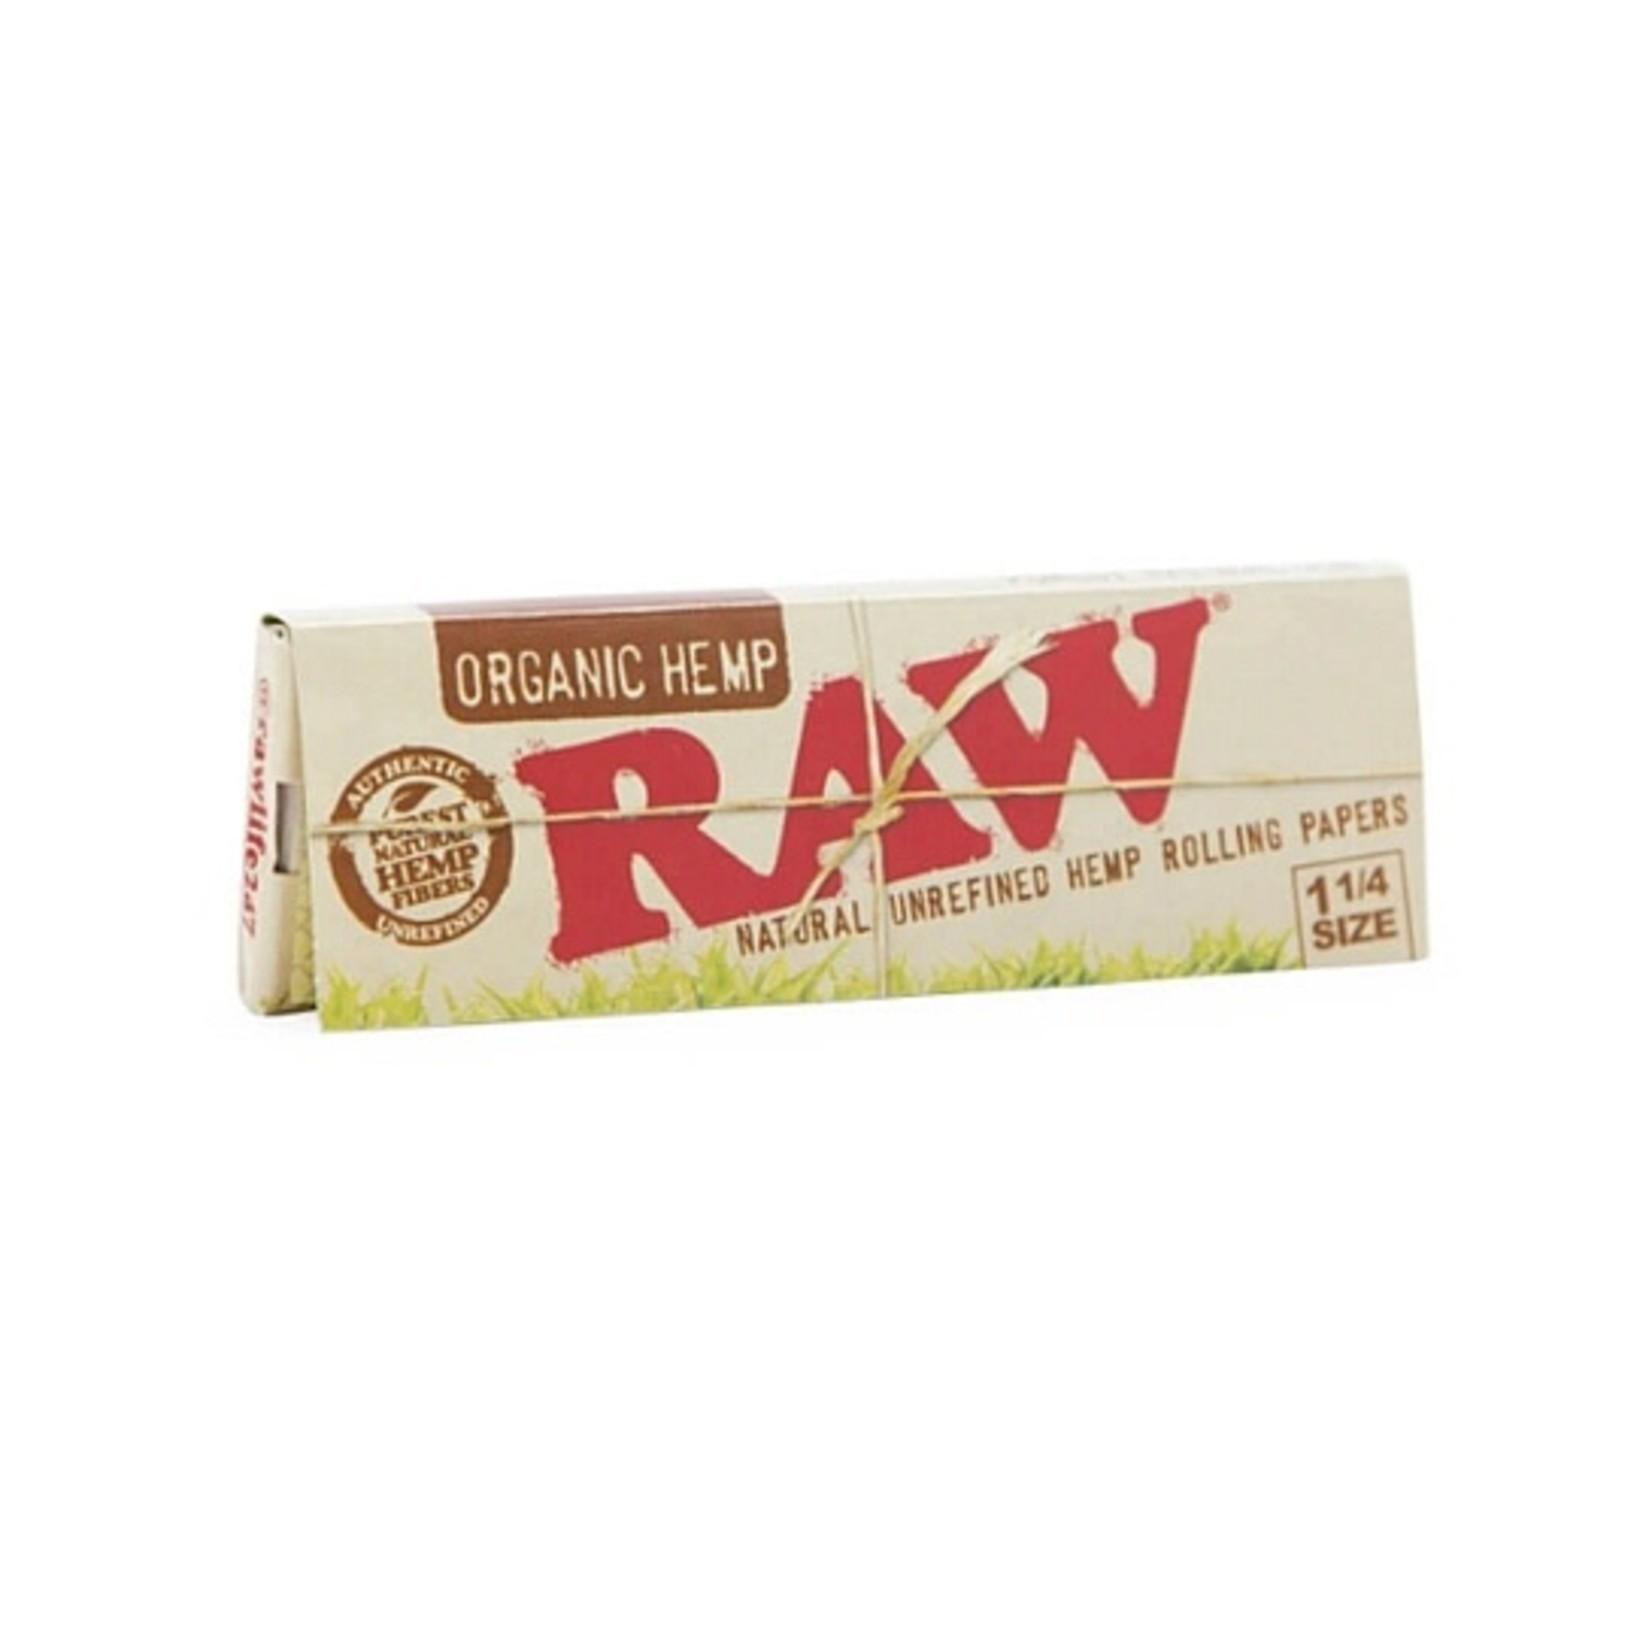 Raw Raw Organic Hemp 1 1/4 Papers